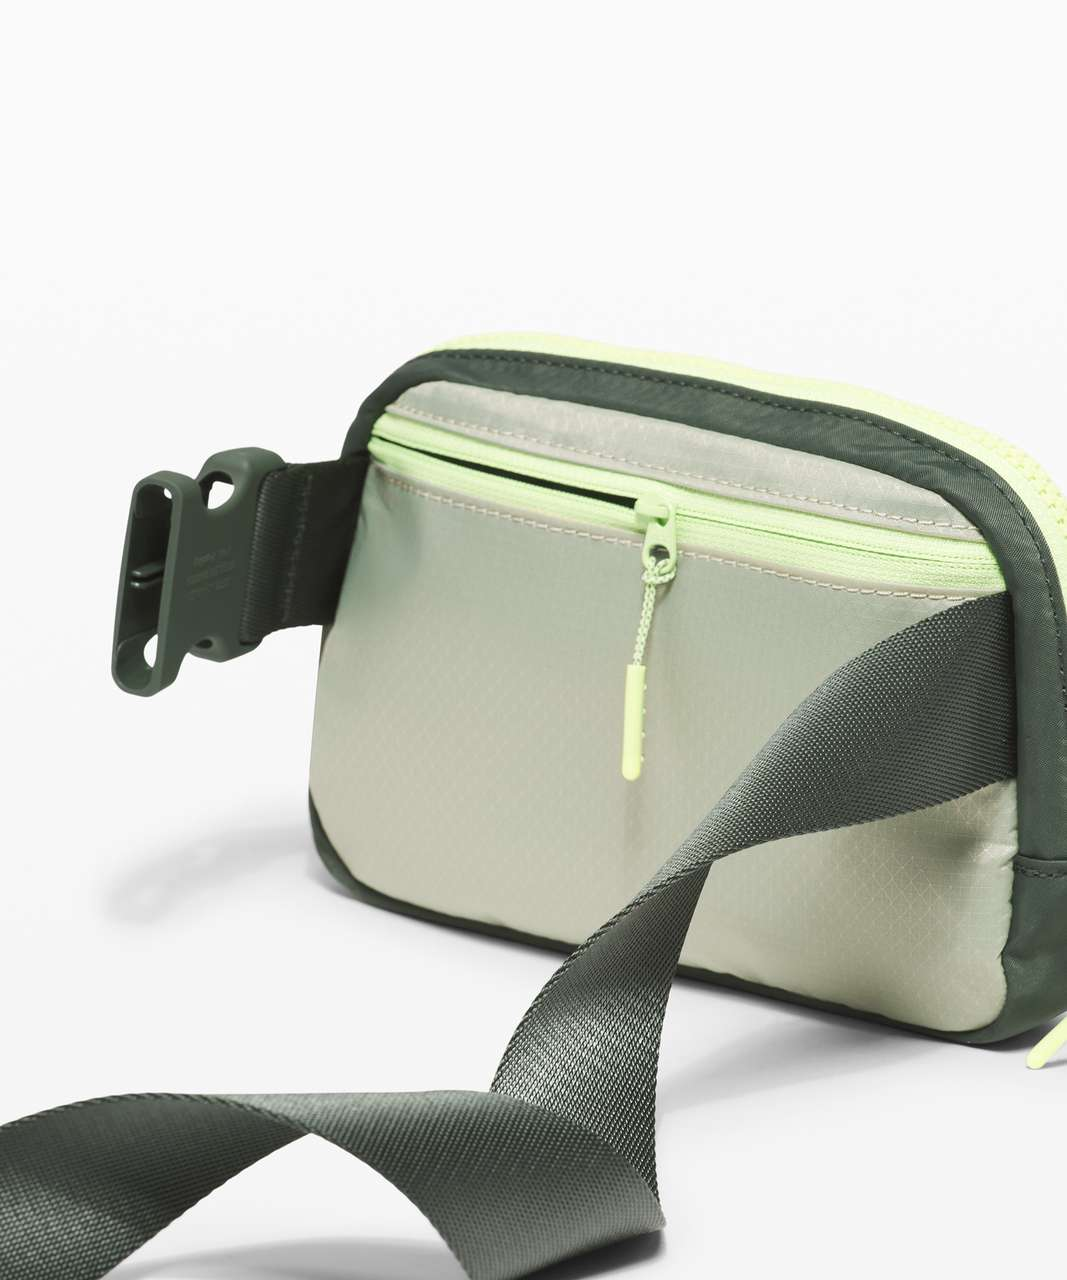 Lululemon Everywhere Belt Bag *1L - Green Fern / Smoked Spruce / Neo Mint